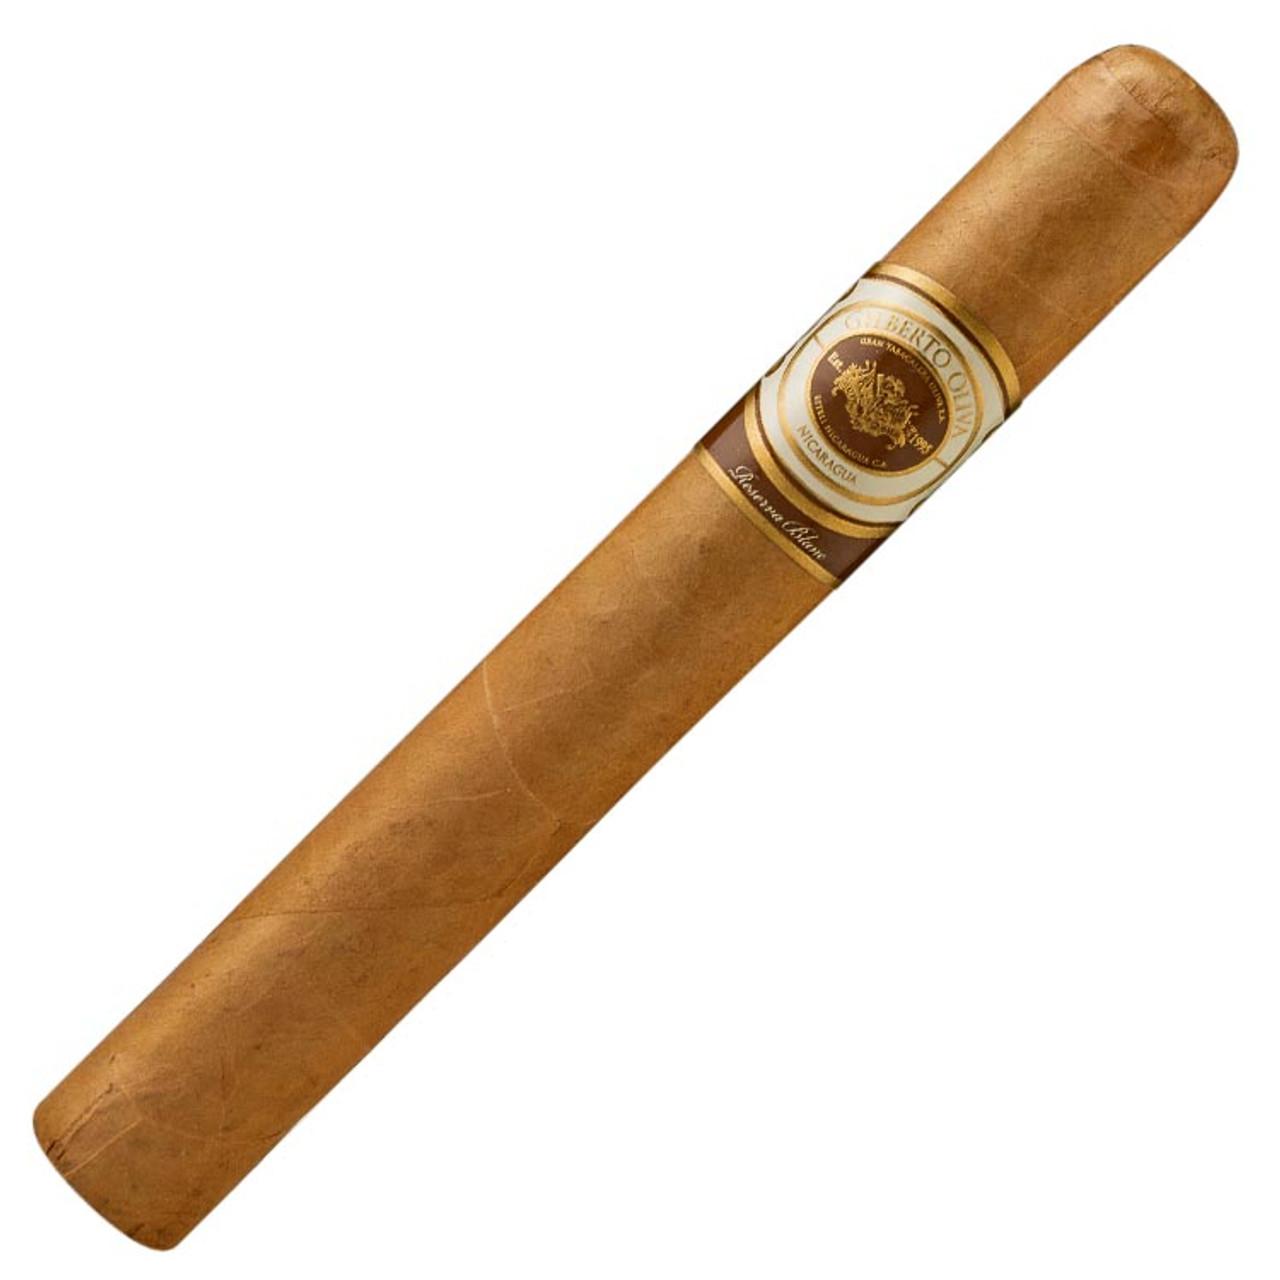 Gilberto Oliva Reserva Blanc Robusto Cigars - 5 x 50 (Box of 20)